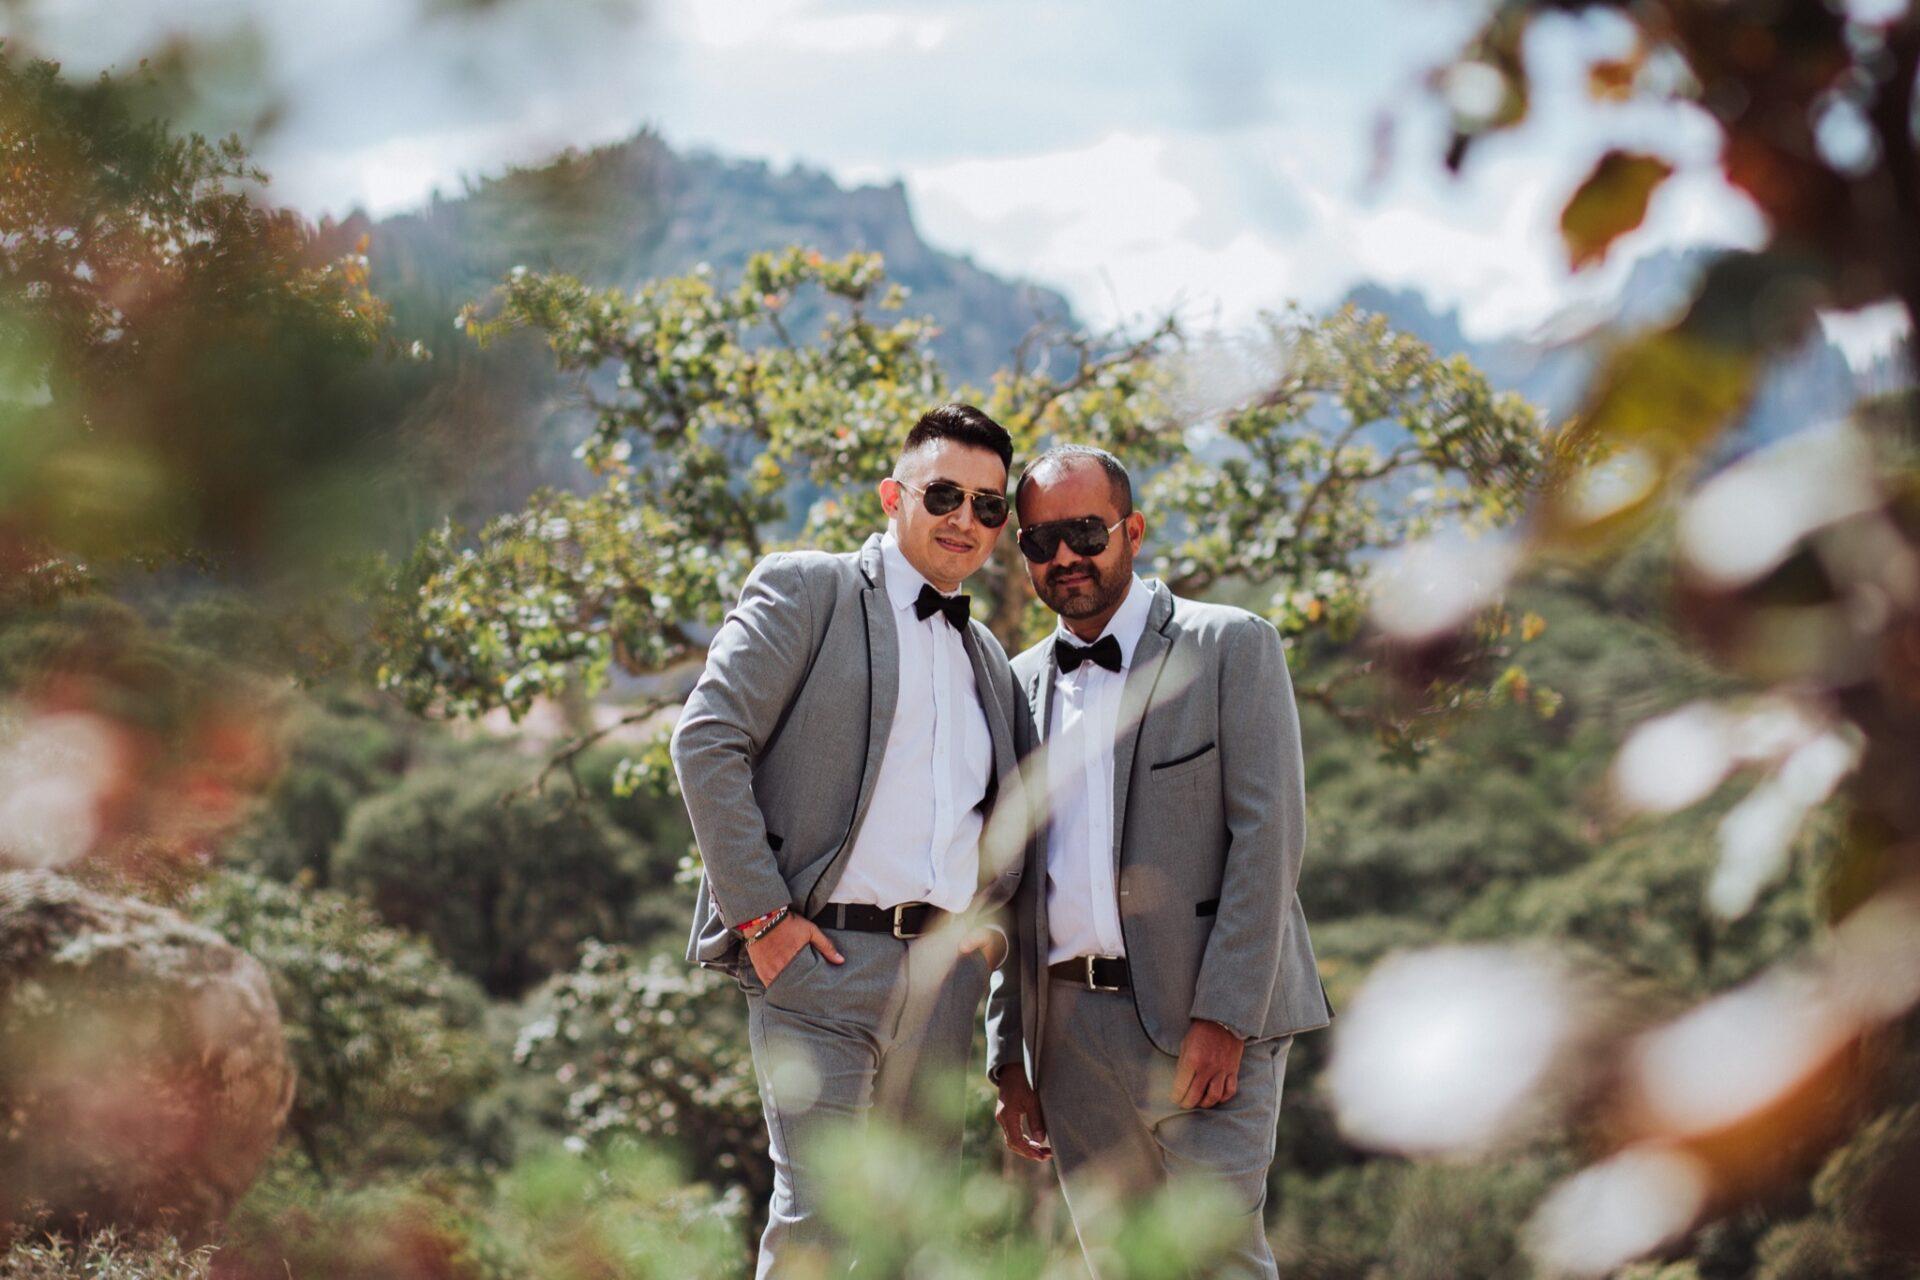 javier_noriega_fotografo_bodas_save_the_date_preboda_zacatecas_wedding_photographer2